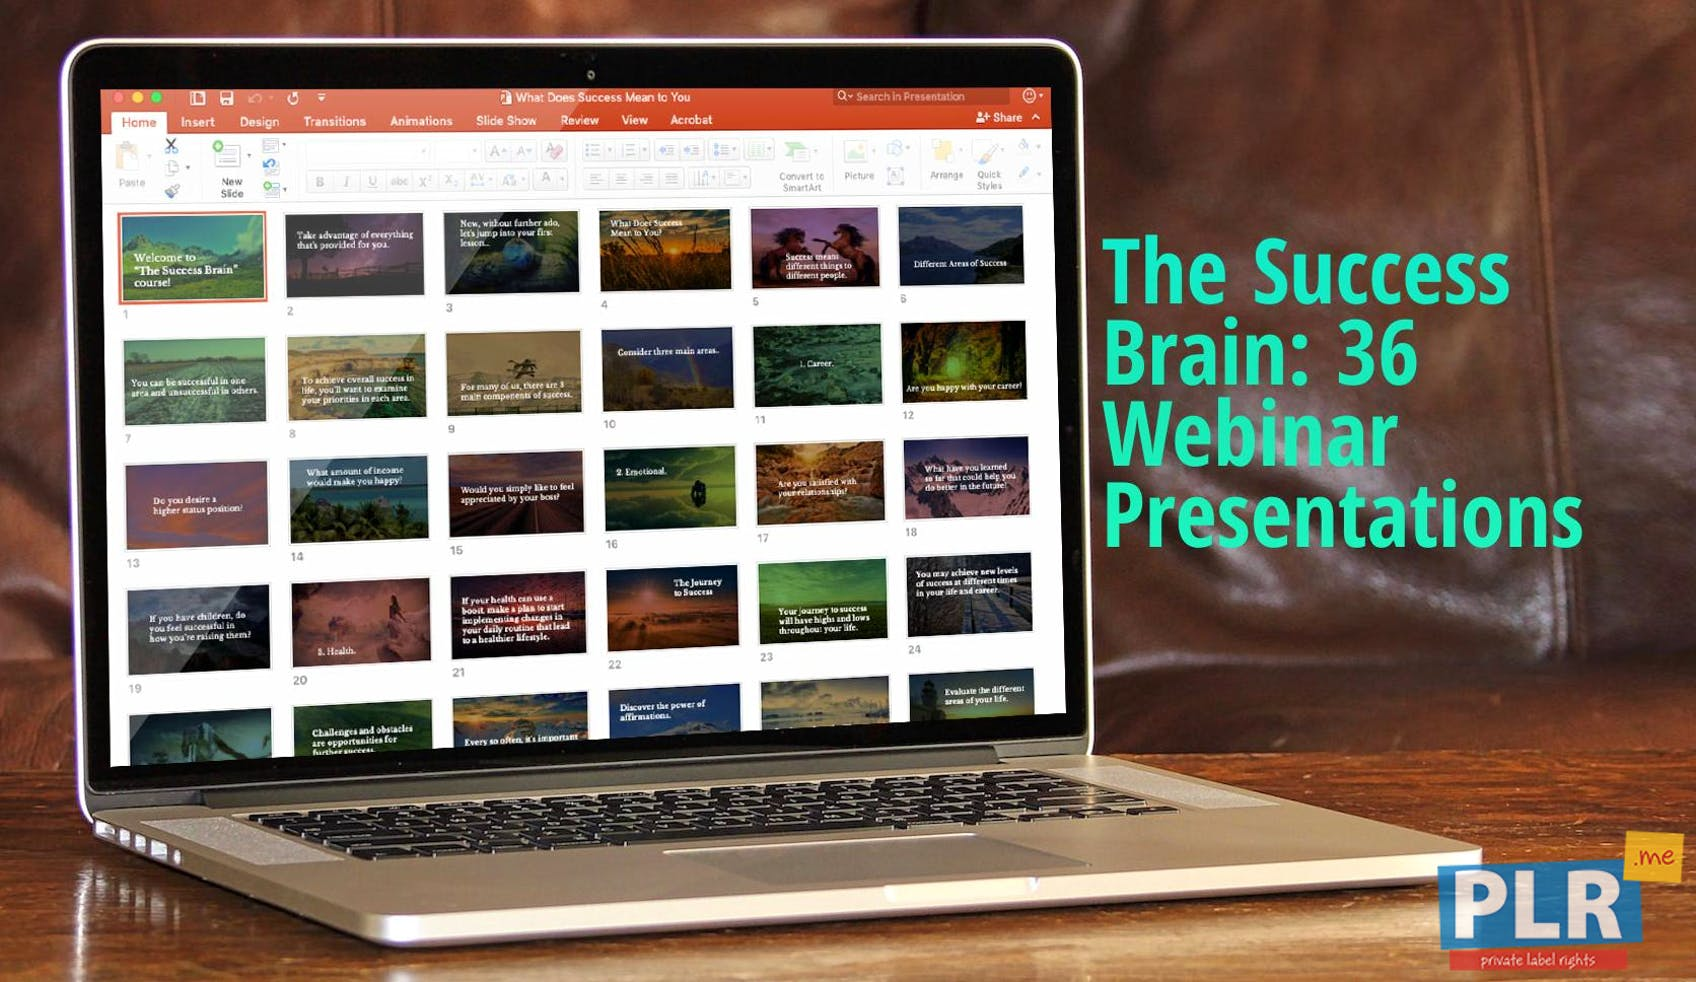 The Success Brain: SMART Goals And Healthy Habits - Presentations